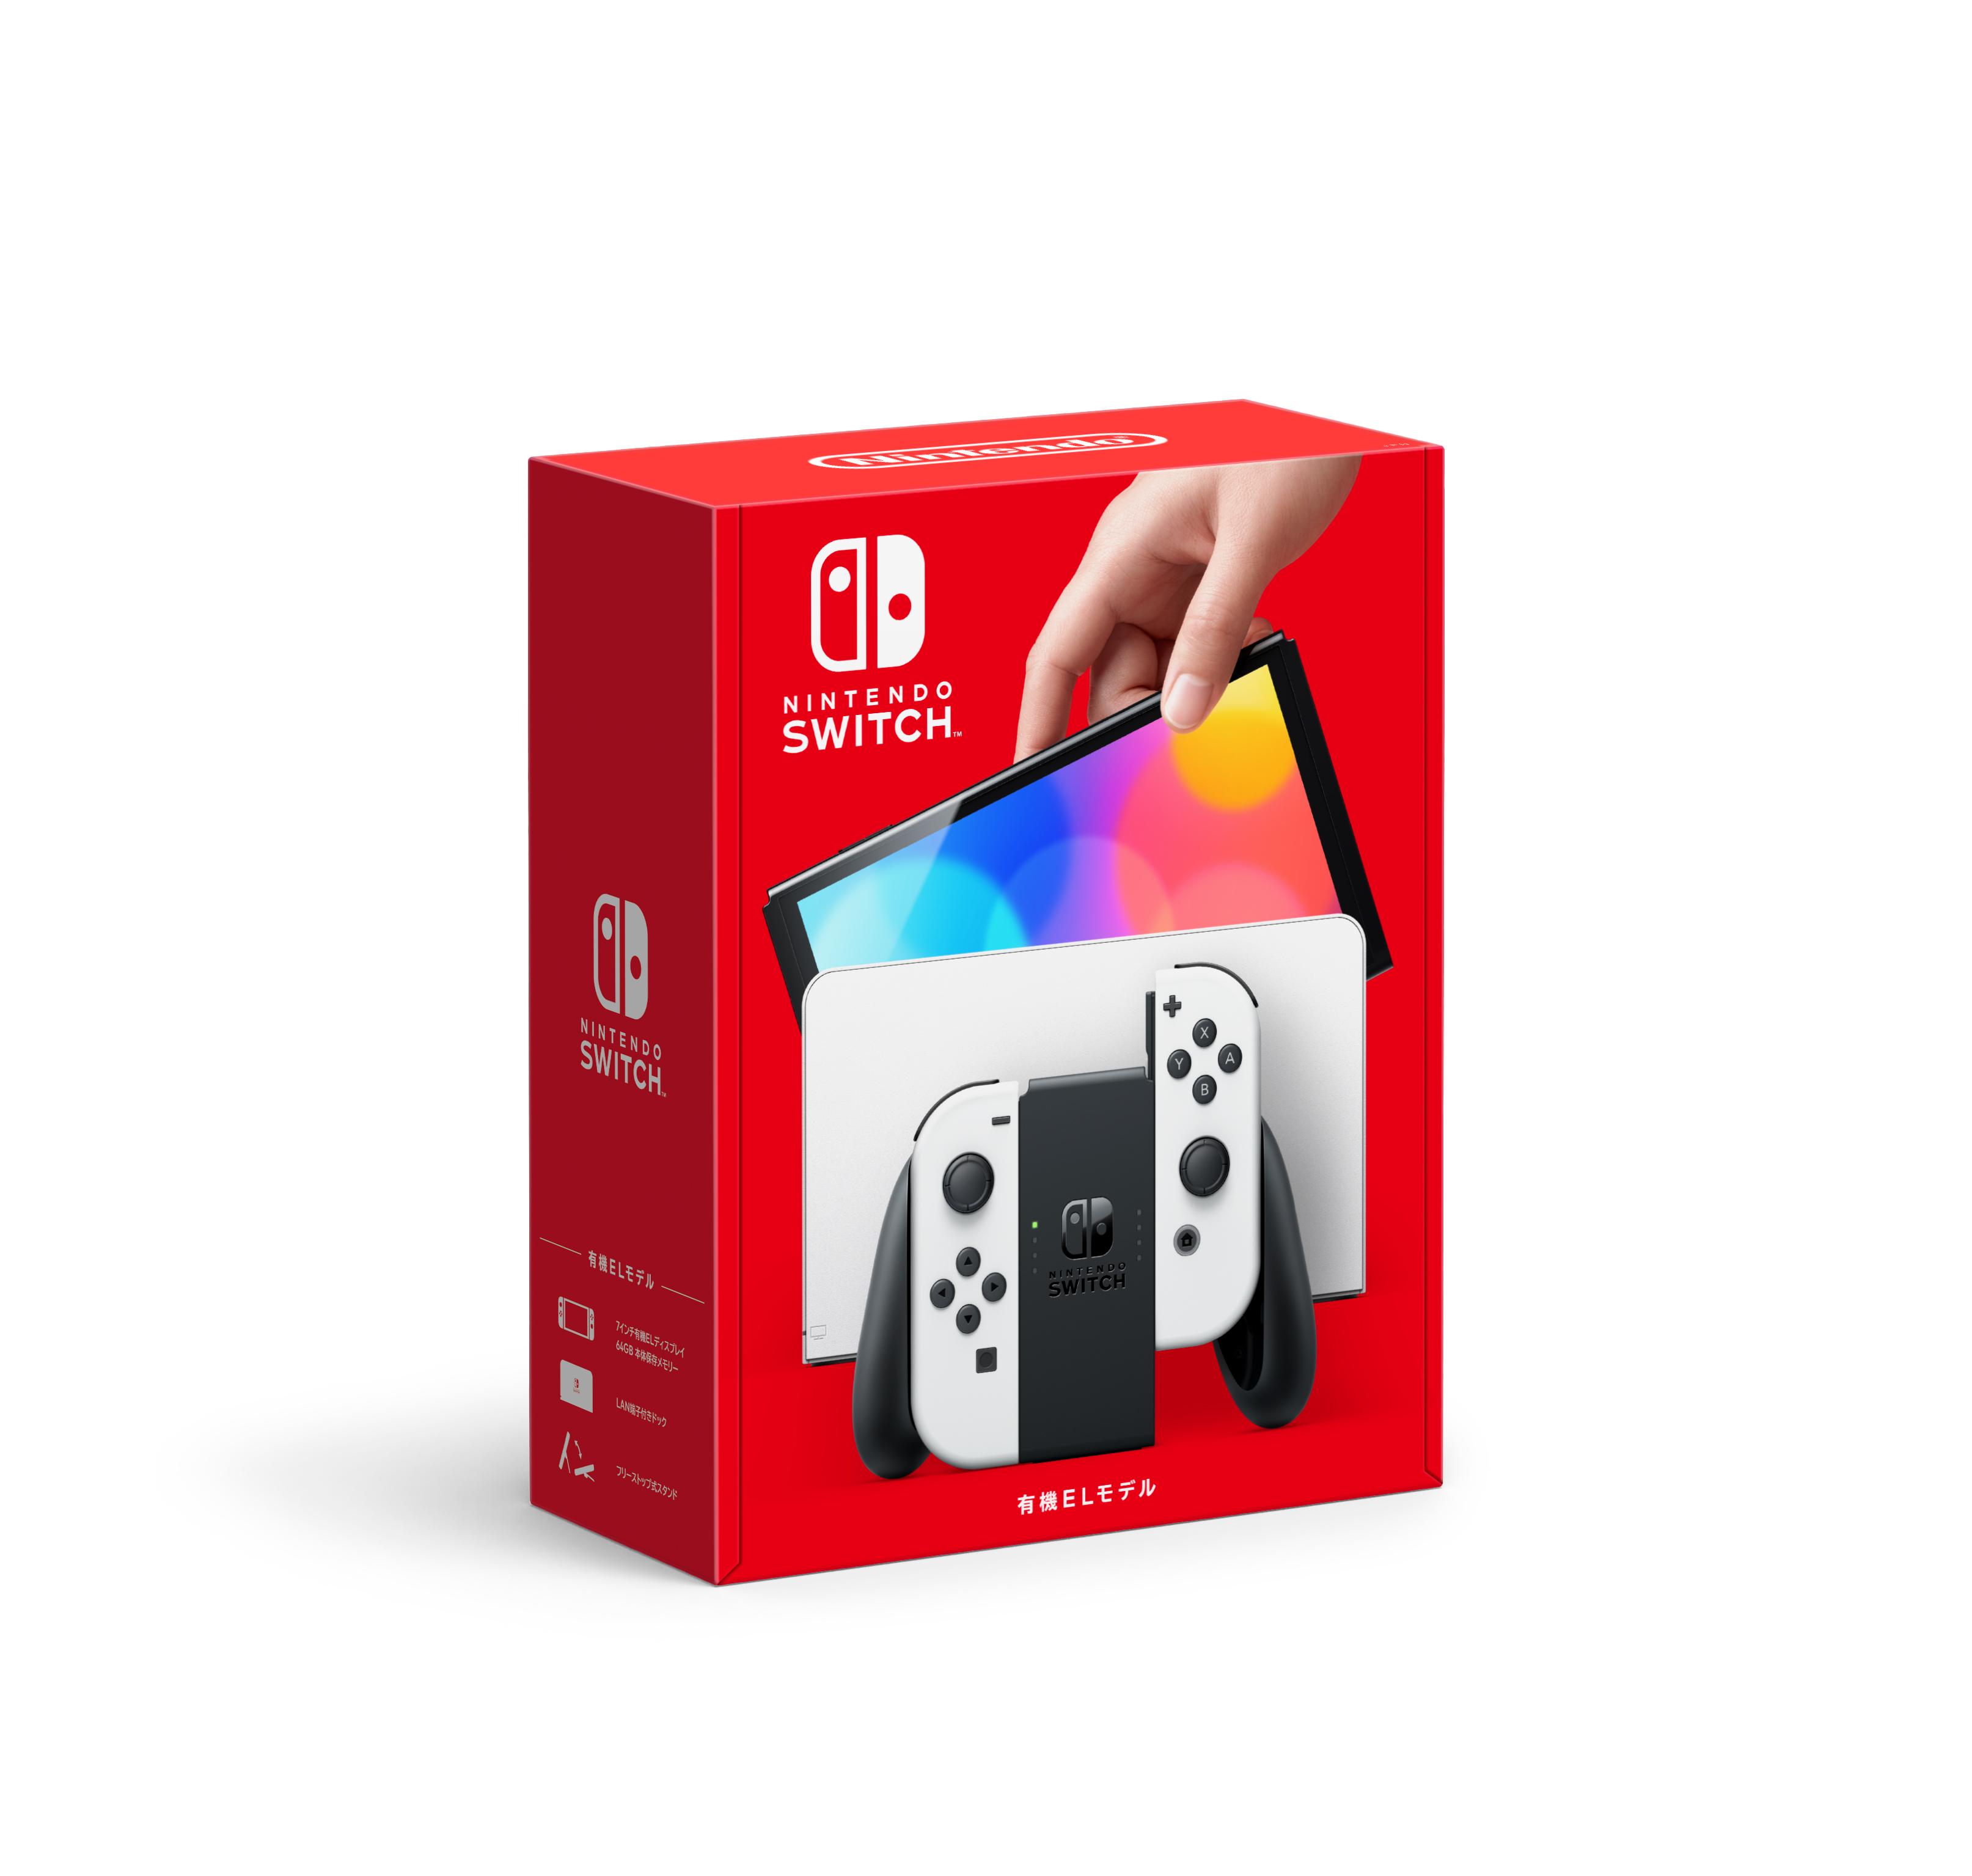 Nintendo Switch (有機ELモデル)本体購入予約券 抽選受付